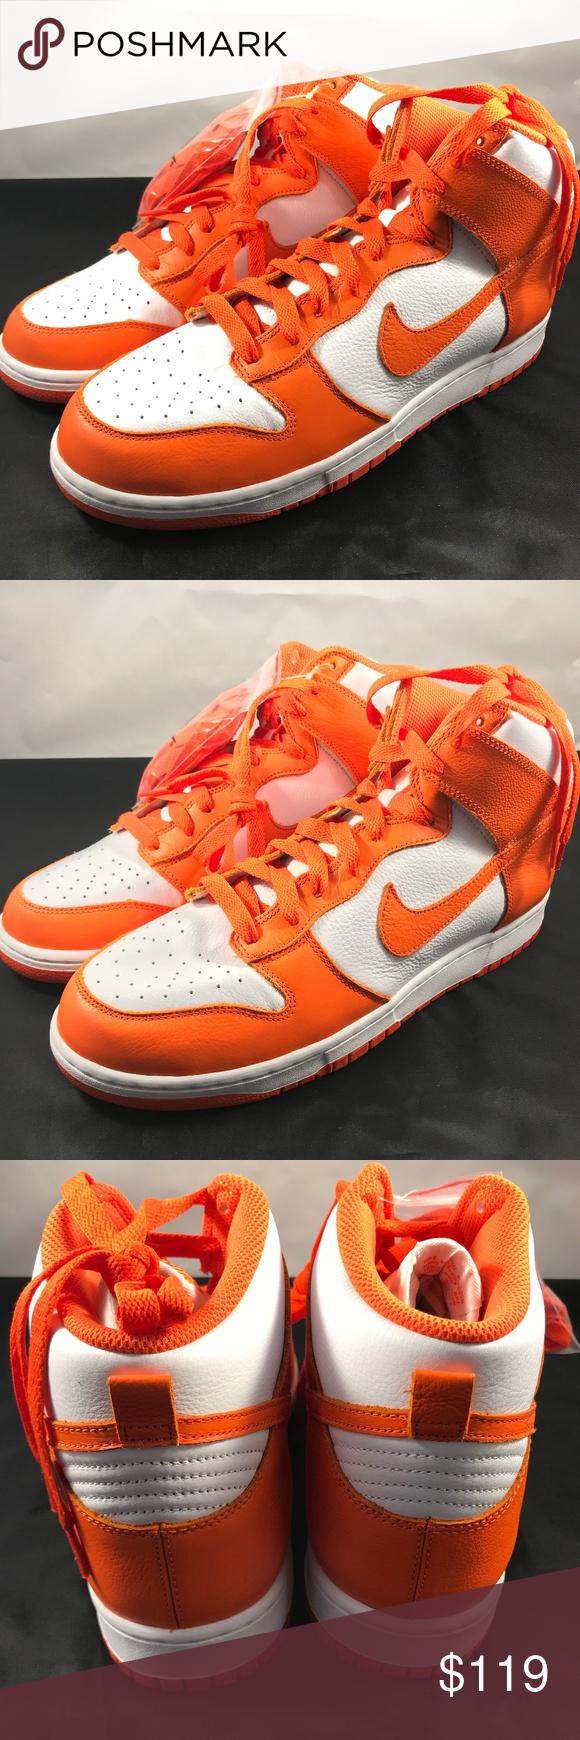 Nike Dunk Retro Qs 850477 101 White Orange Blaze Nike Dunk Retro Qs 850477 101 White Orange Blaze Brand New Syracuse Orangemen Co Nike Dunks Nike Sneakers Nike